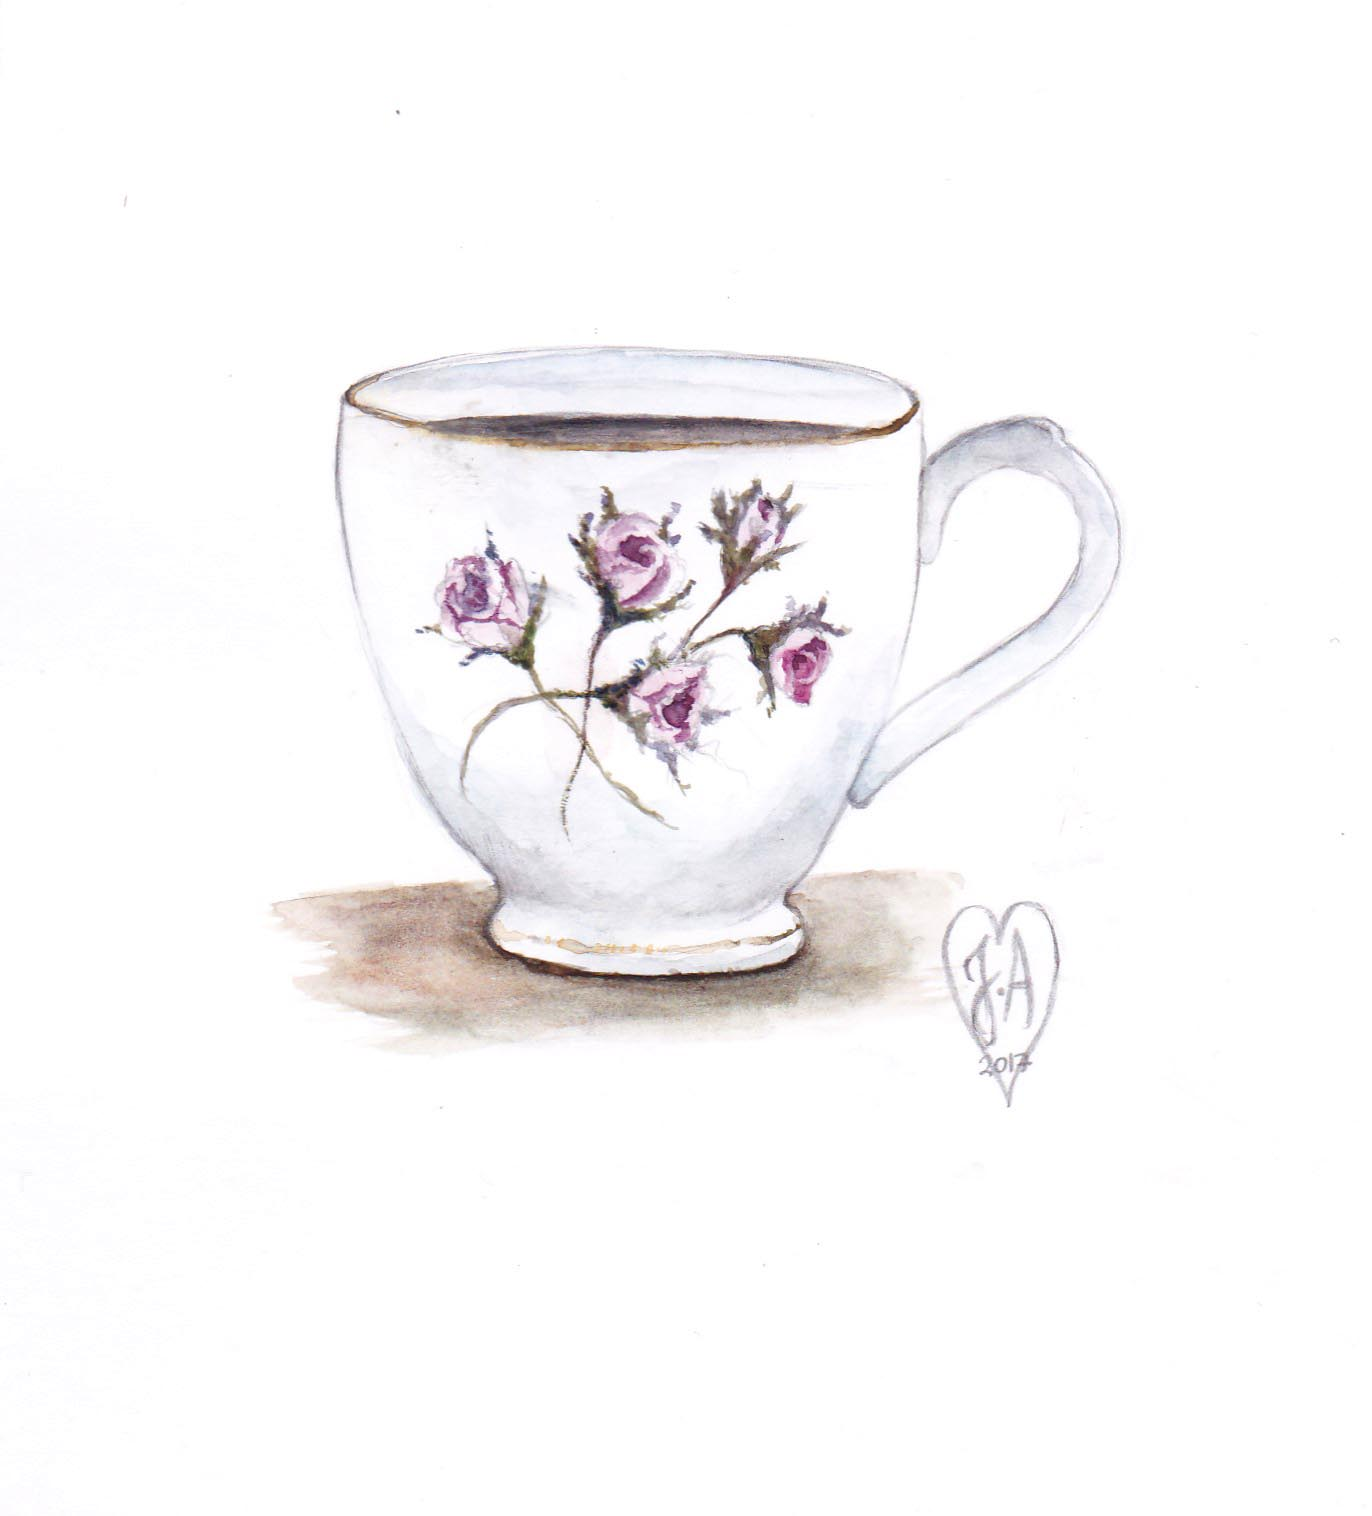 Kopp i akvarell